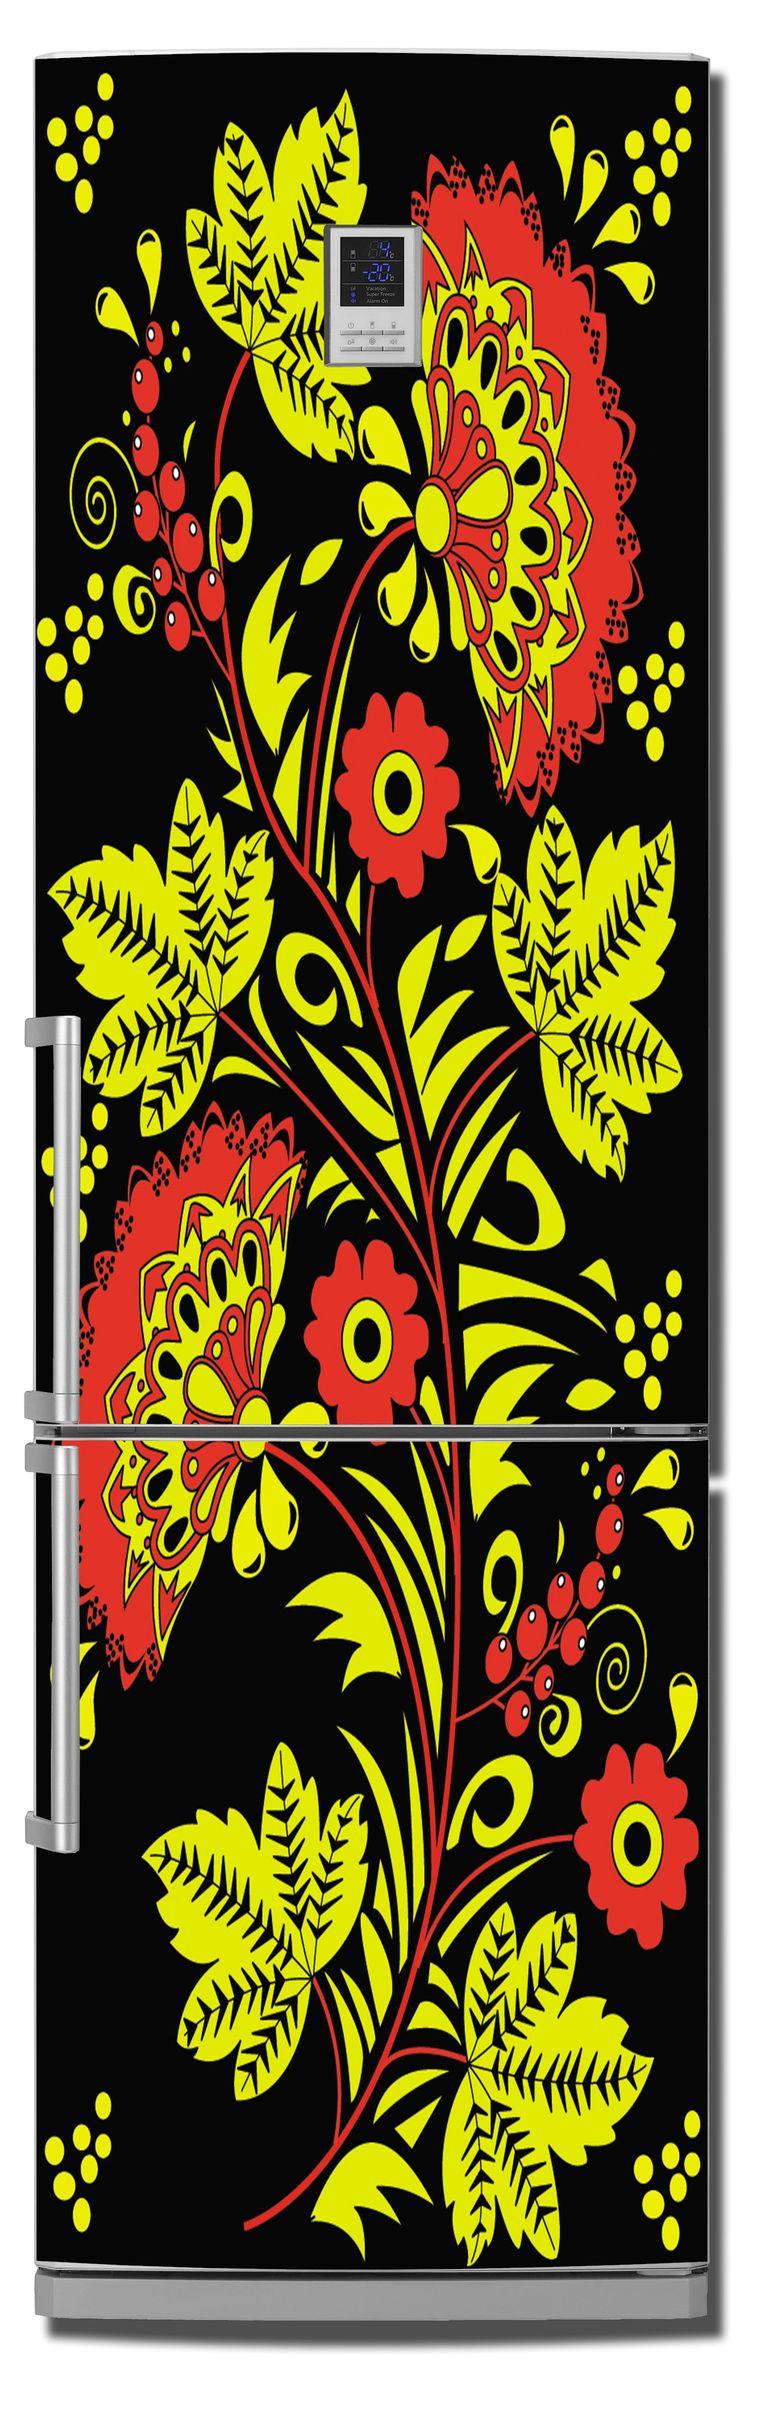 Виниловая наклейка на холодильник -  Хохлома 1